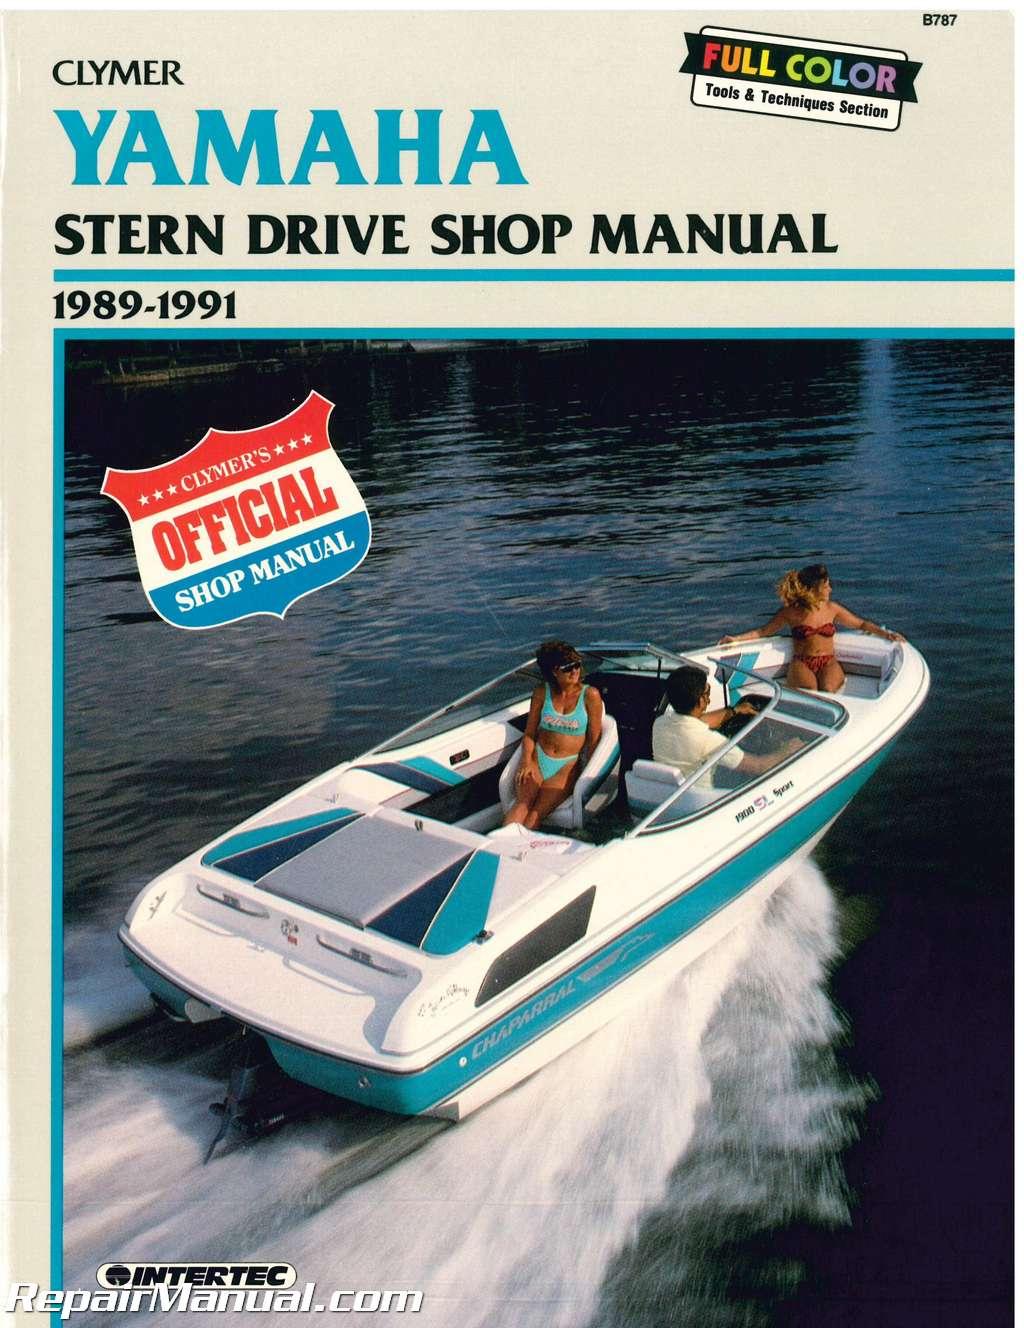 yamaha stern drive 1989 1990 1991 clymer boat engine repair manual rh repairmanual com Clymer Freeride Clymer Repair